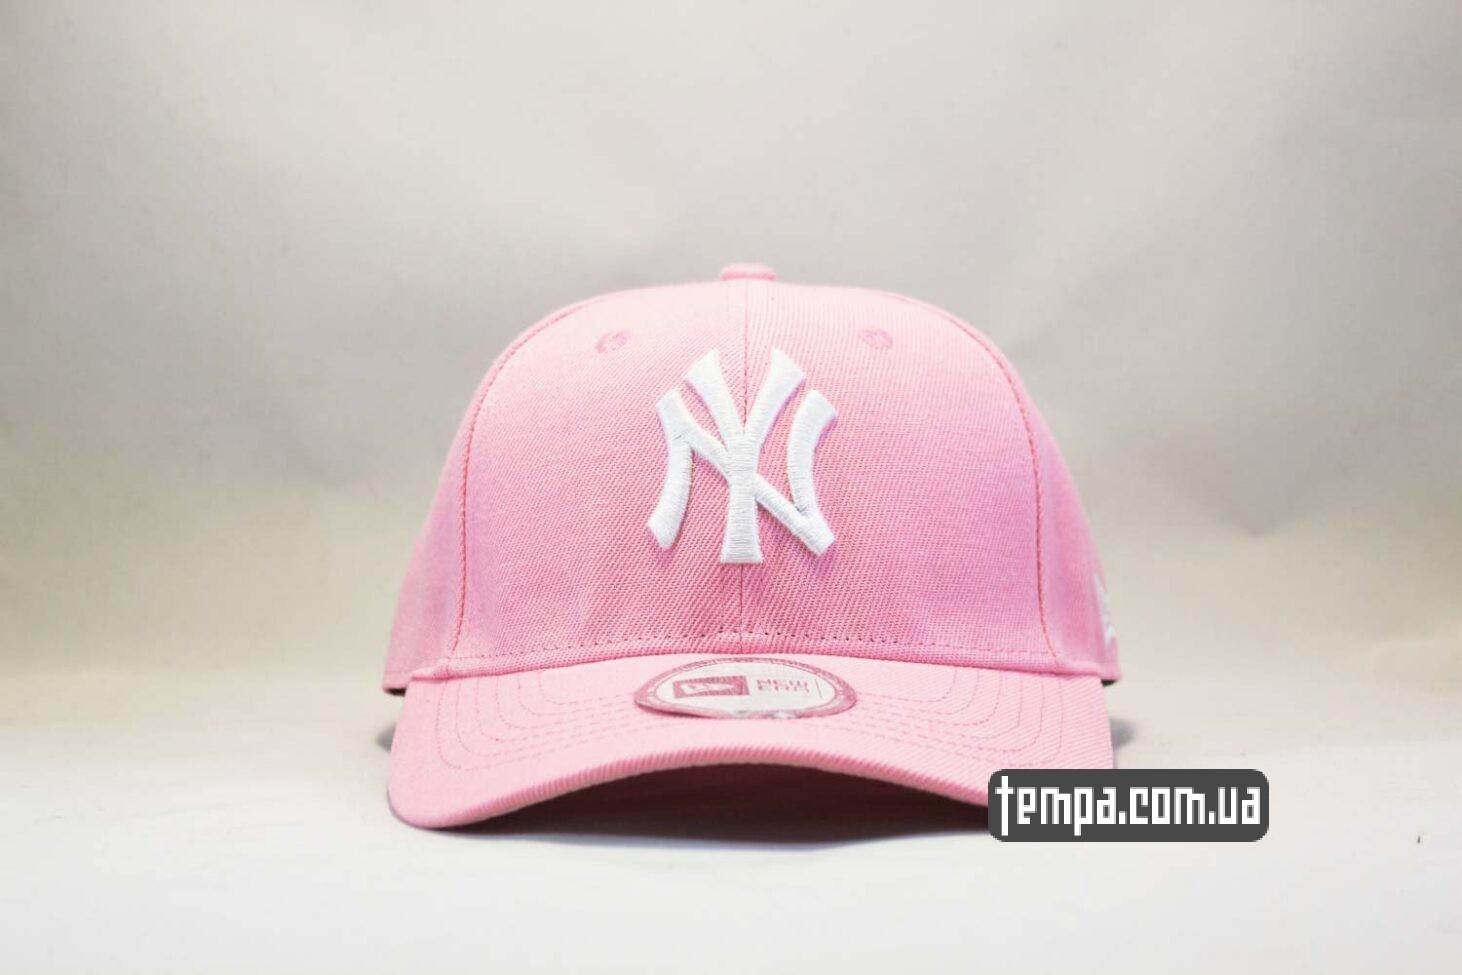 кепка бейсболка New Era Yankees Pink розовая бейсболка